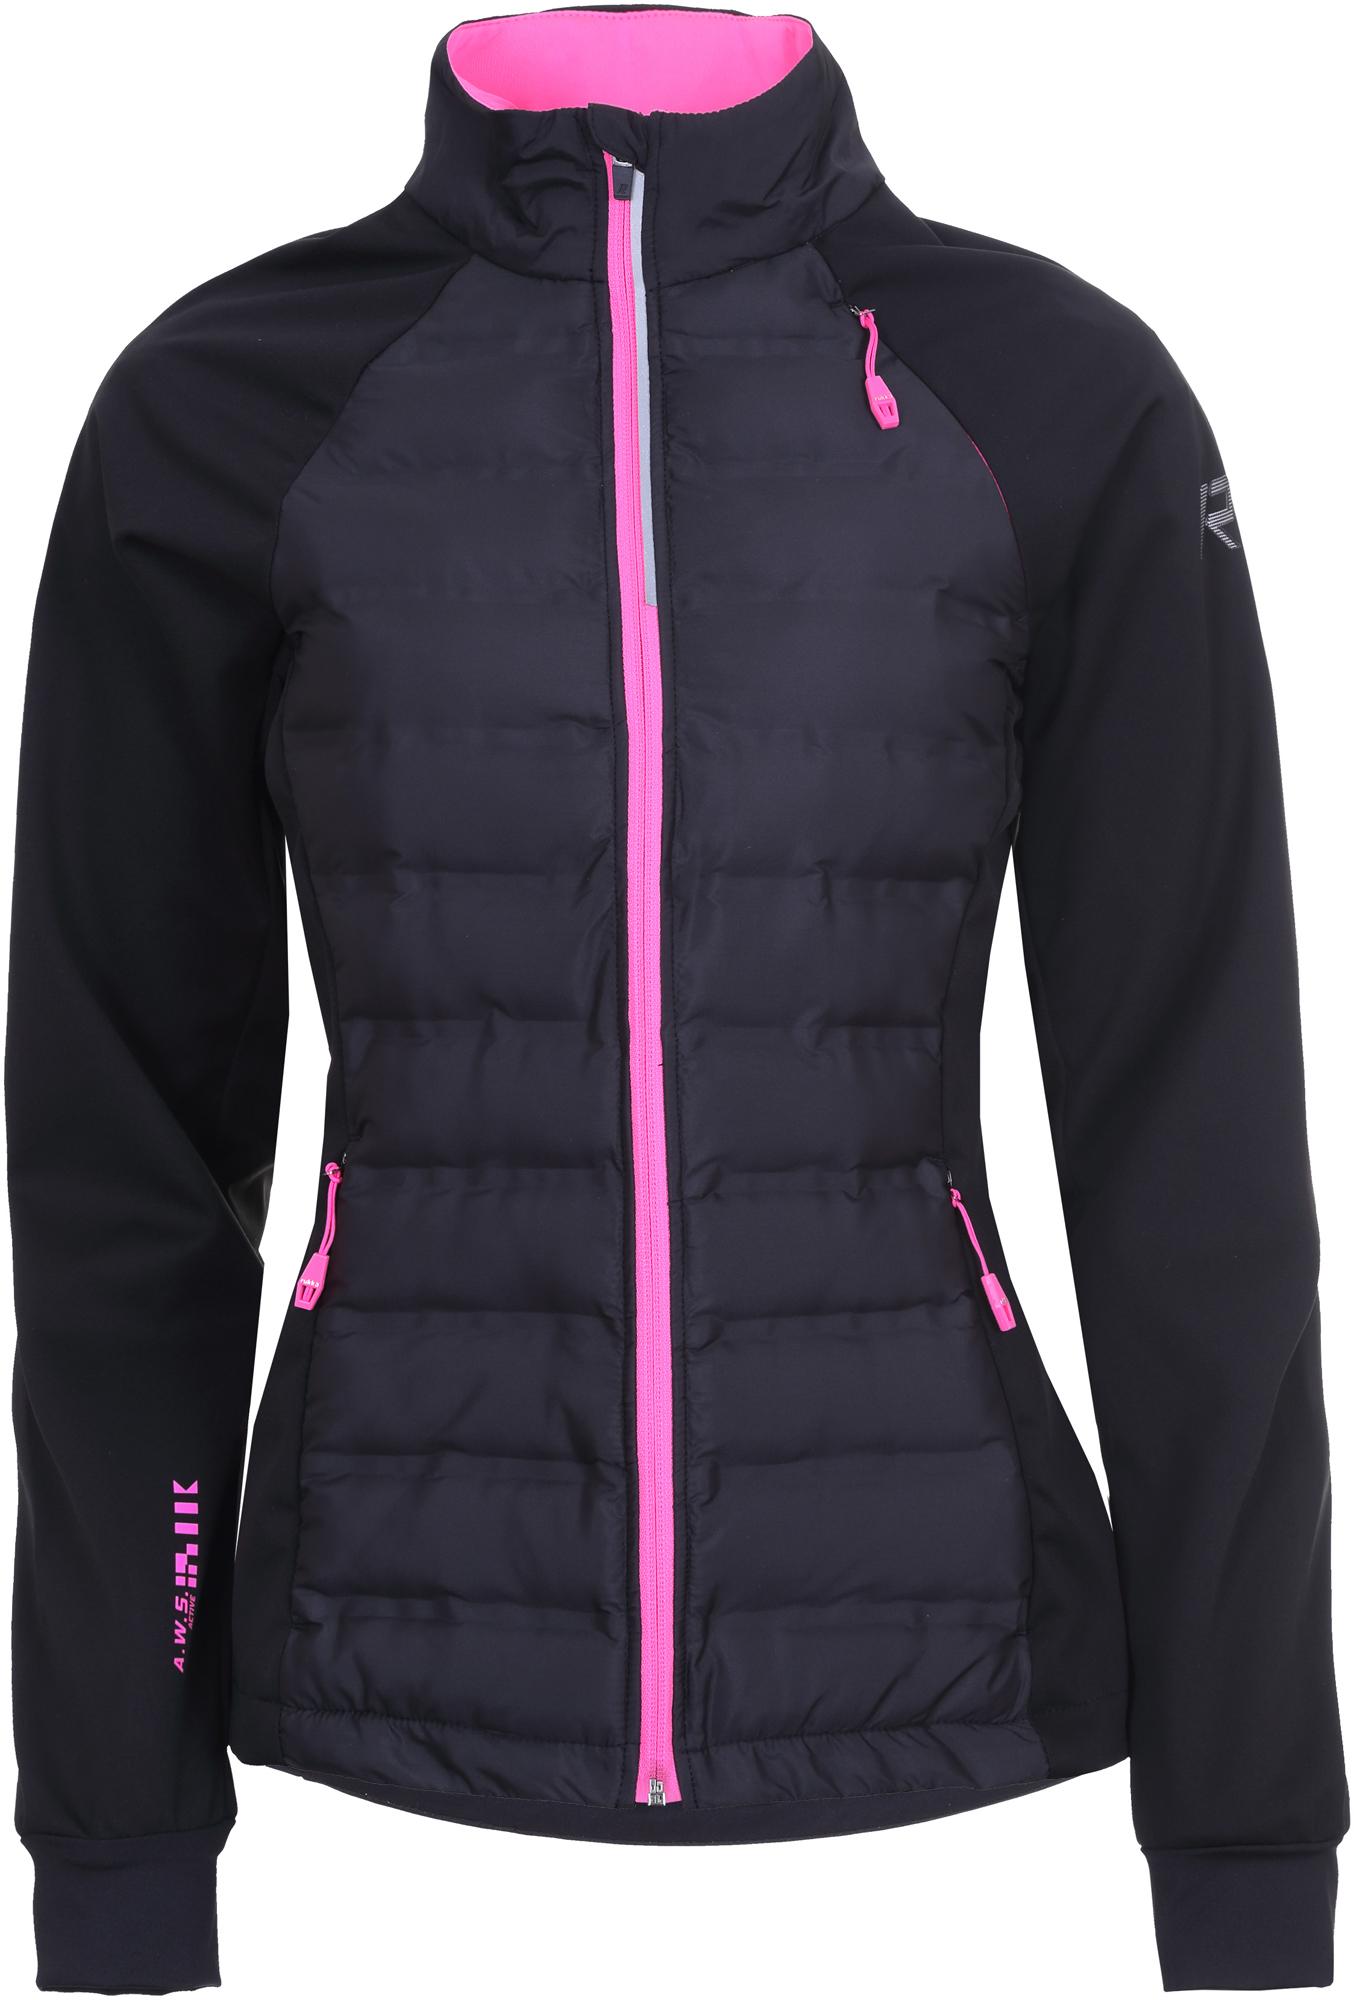 Rukka Куртка утепленная женская Tampella, размер 50